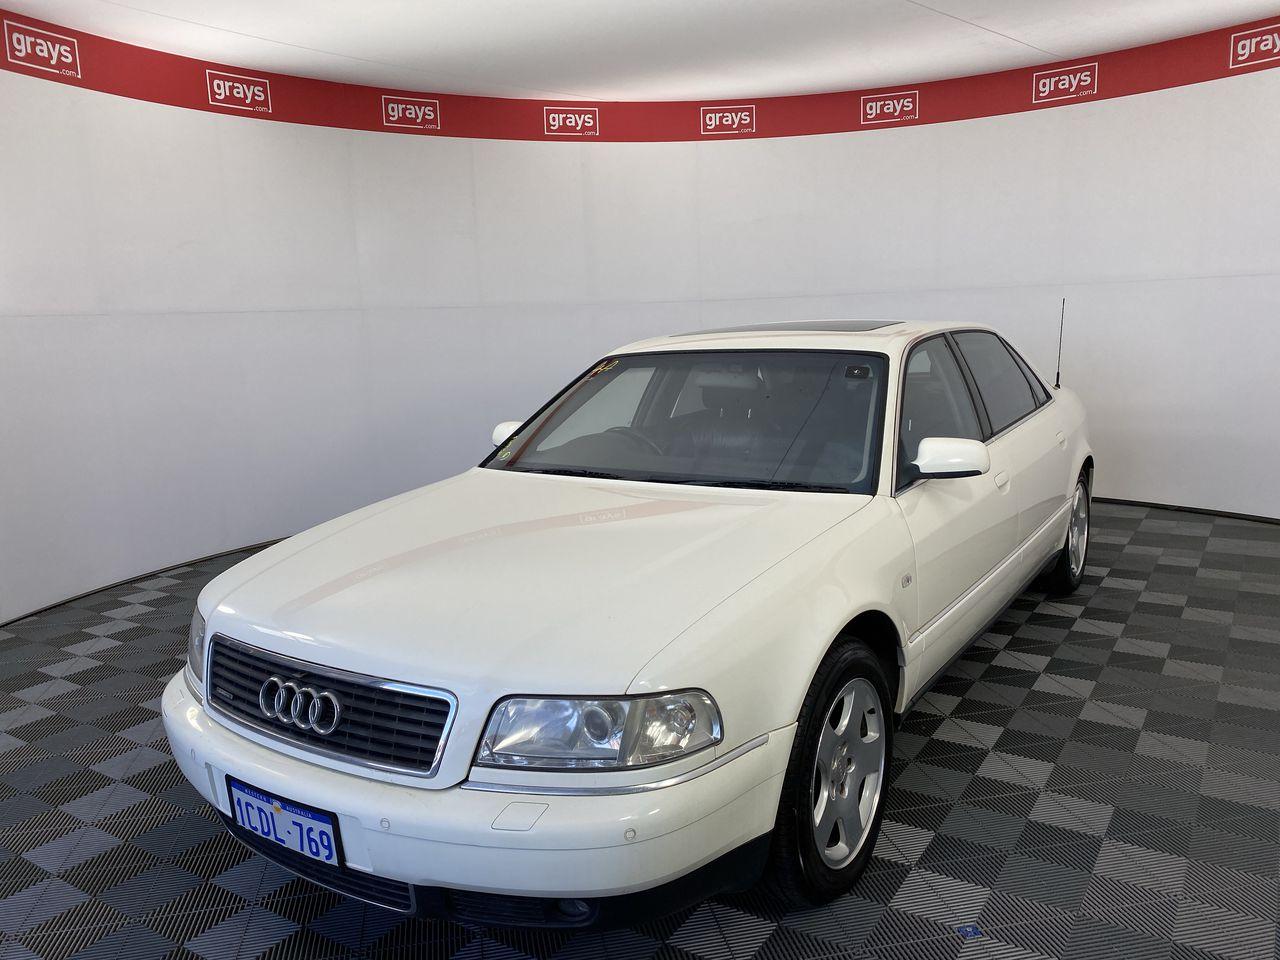 2001 Audi A8 L QUATTRO D2 Automatic Sedan